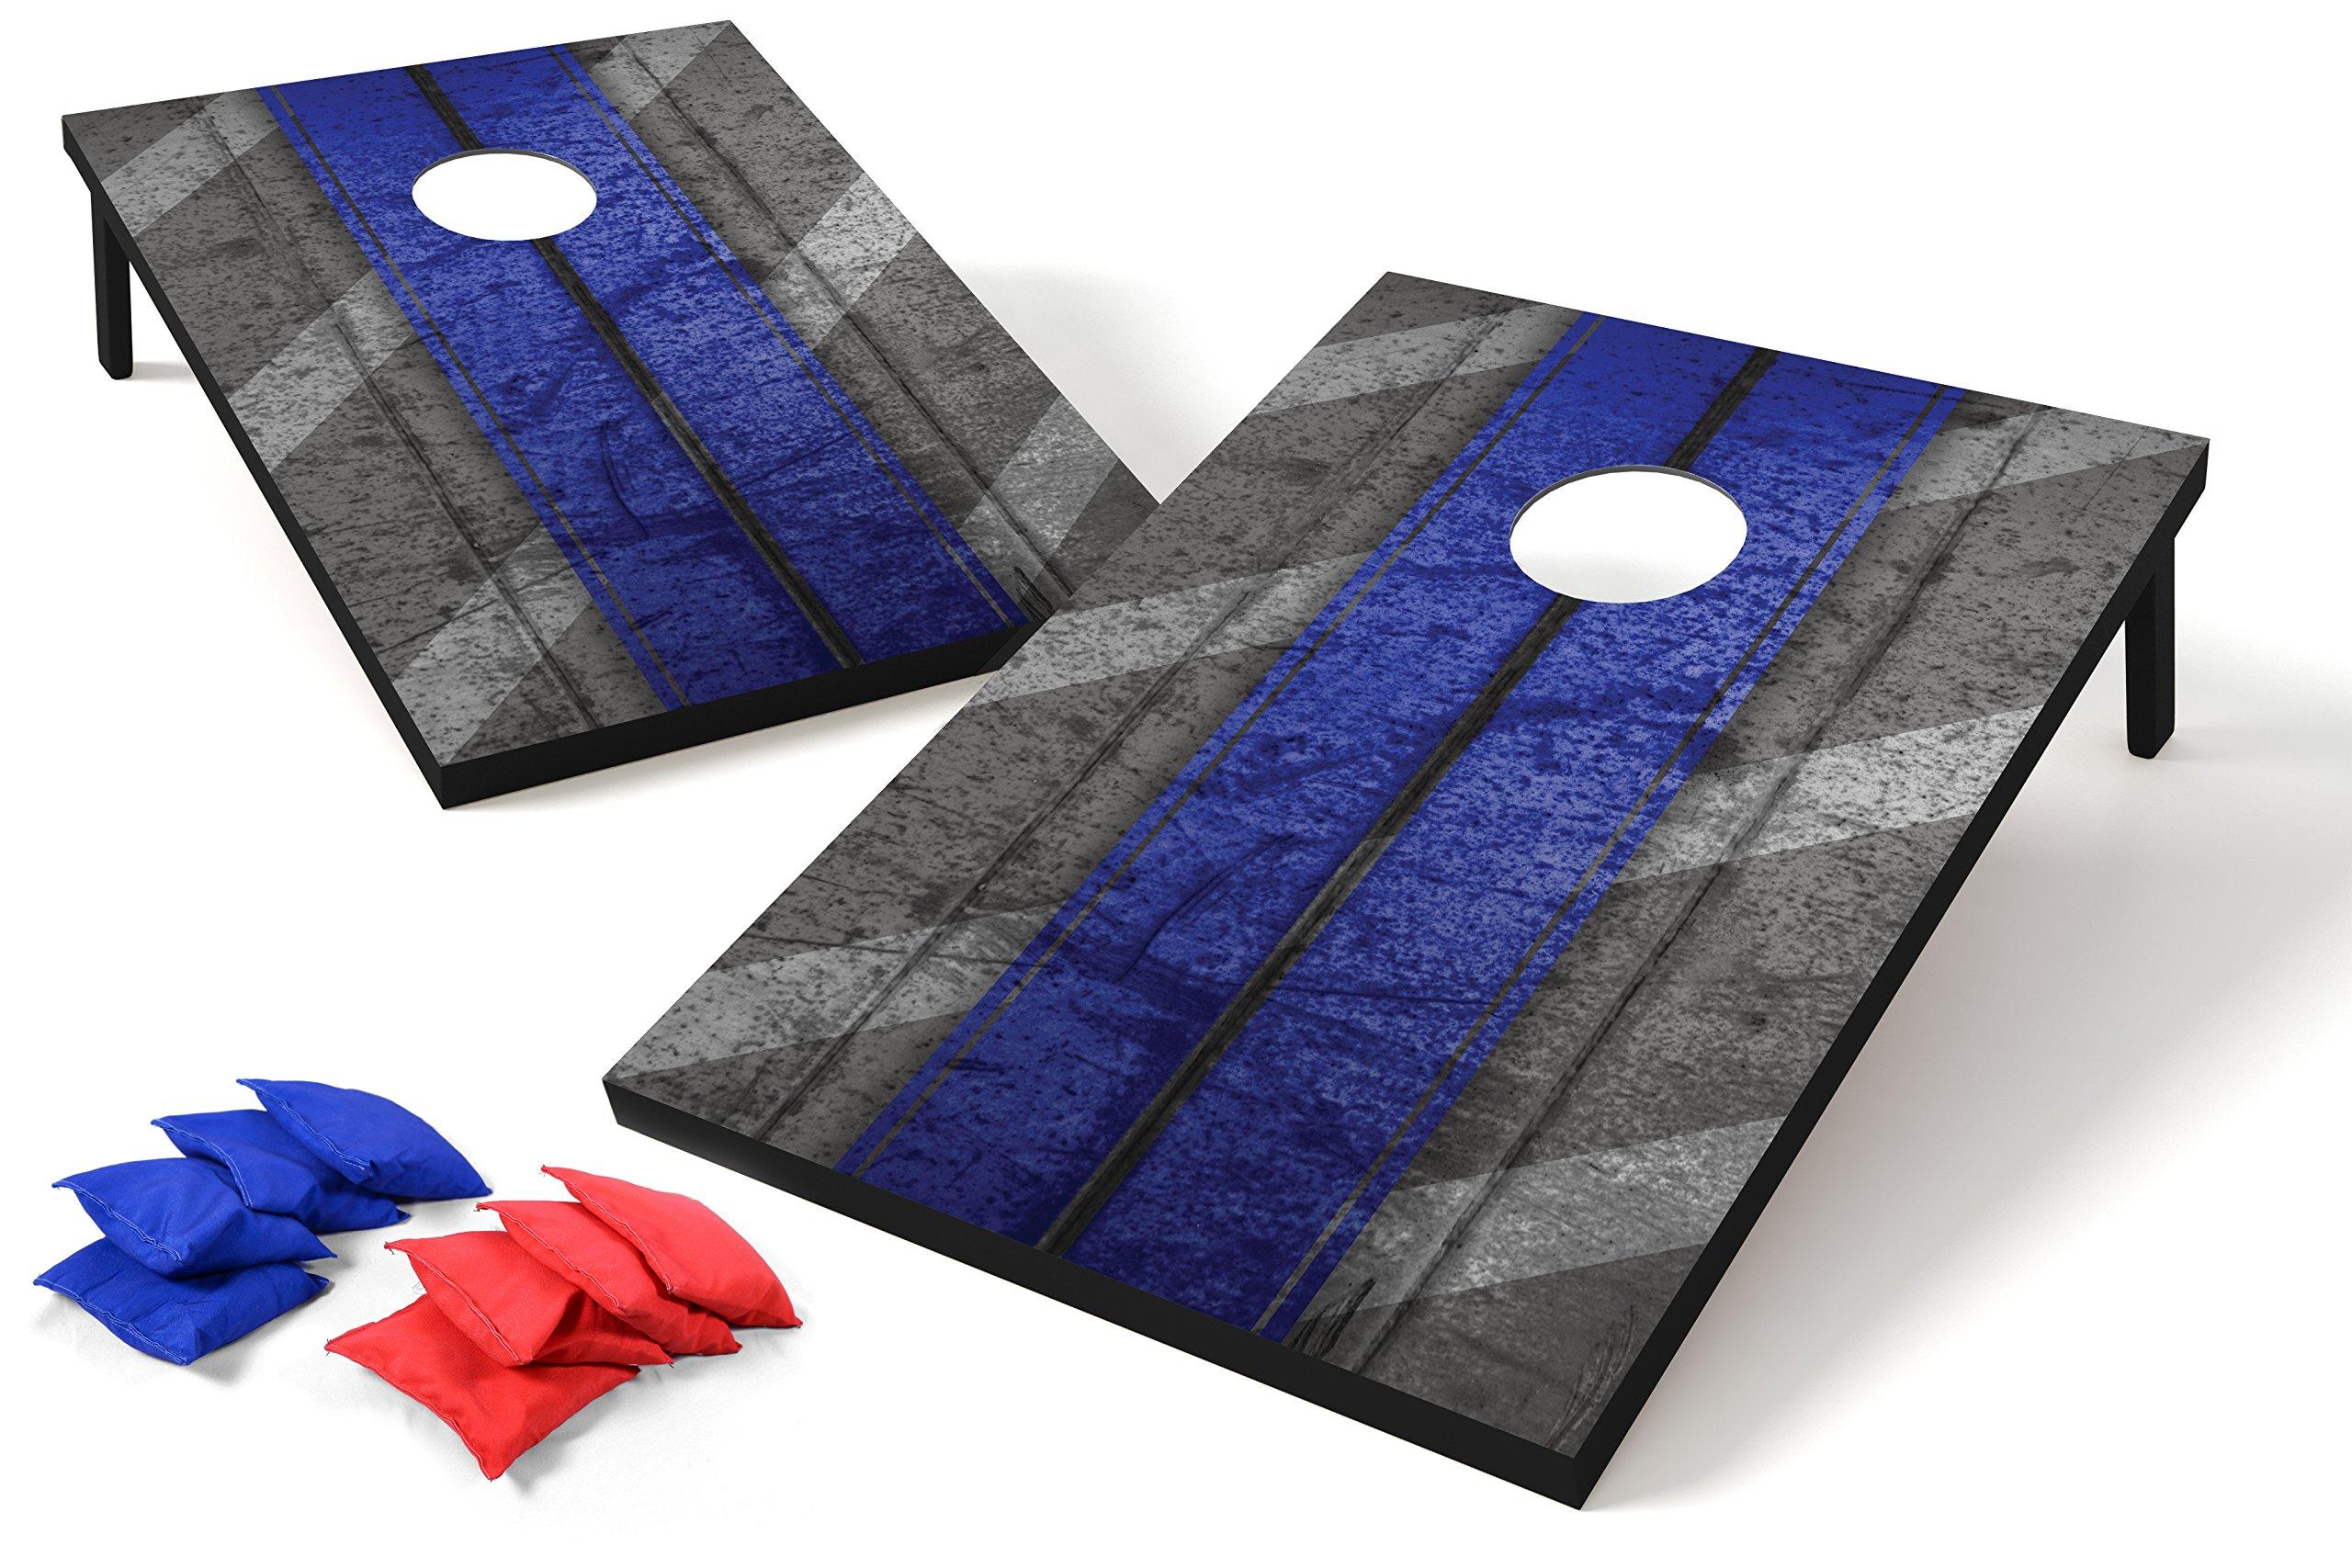 Backyard Champs Tailgate MDF Cornhole with 8 Regulation Bean Bag Set - 2 x 3 Feet, Blue by Backyard Champs